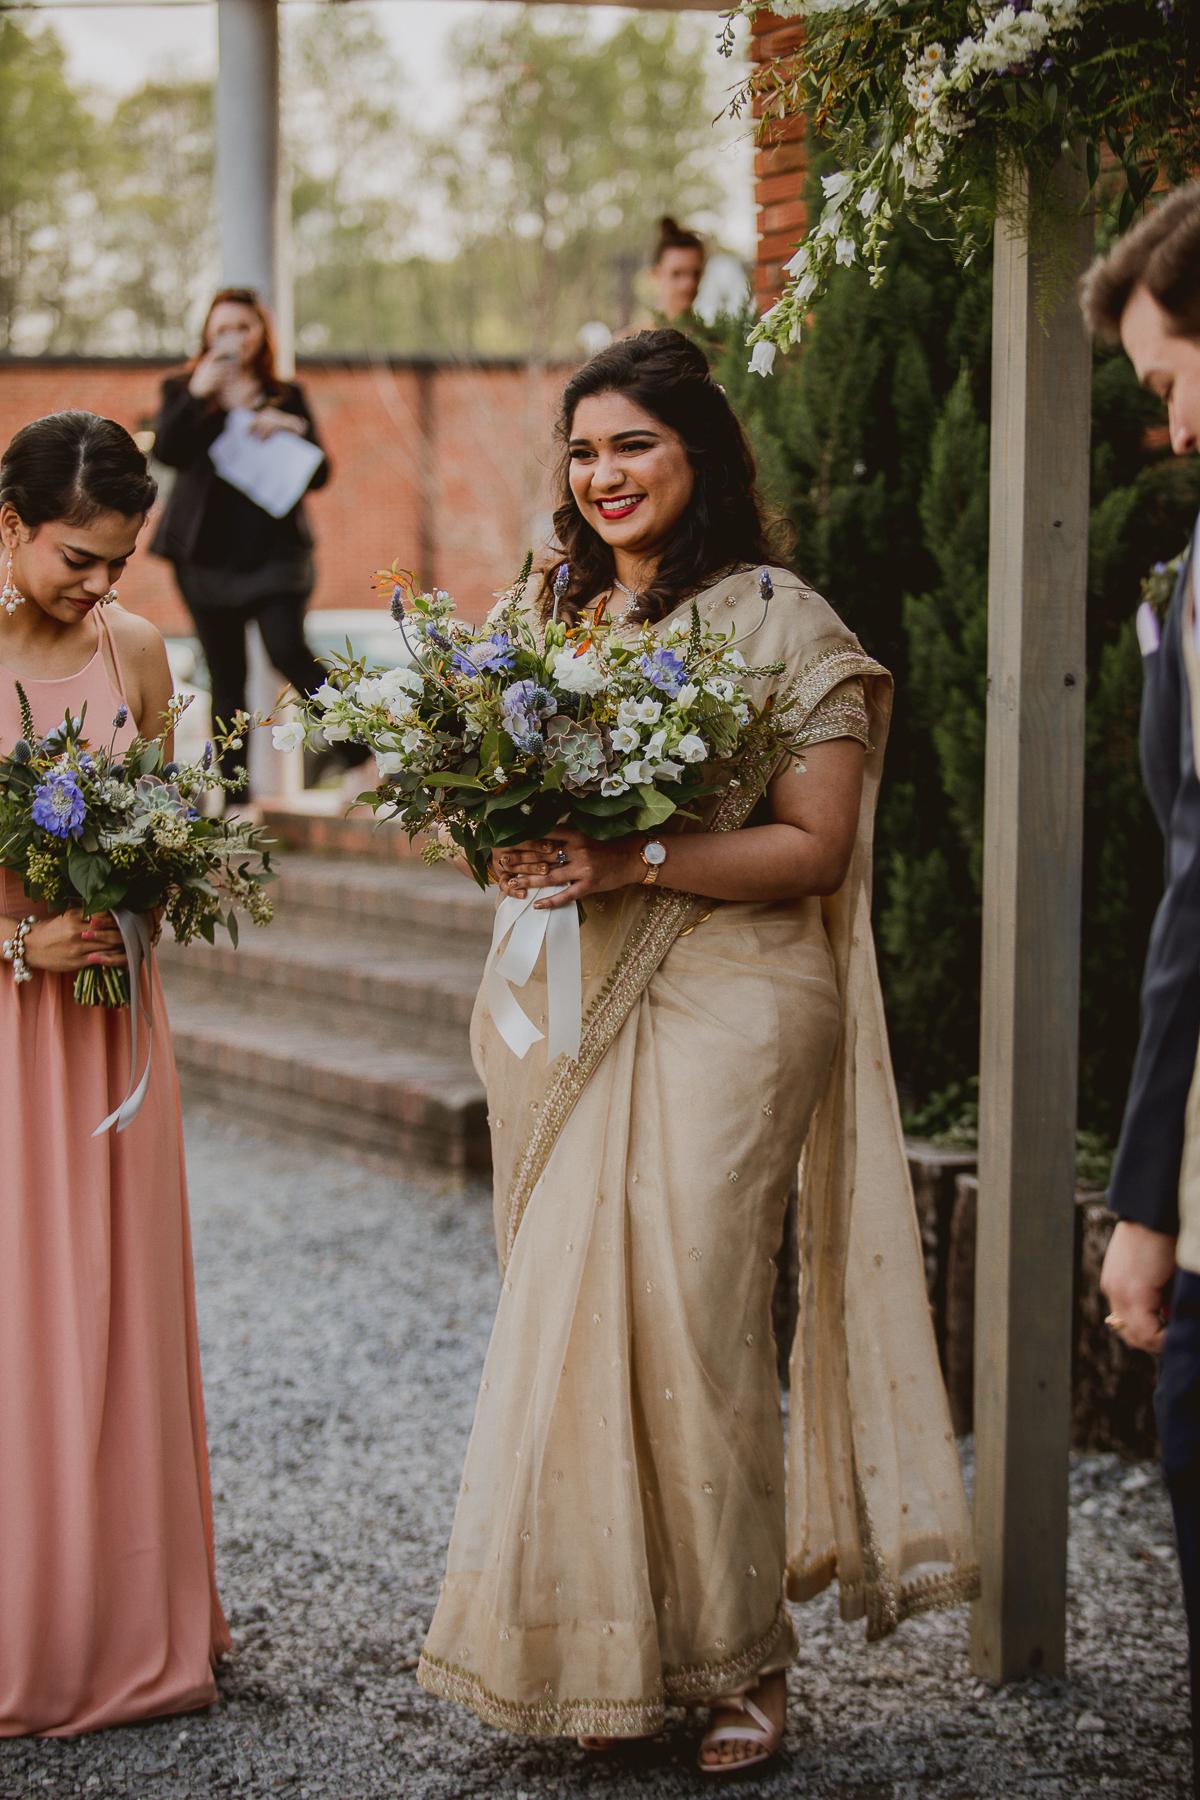 eventide-brewery-indian-american-fusion-kelley-raye-atlanta-los-angeles-wedding-photographer-53.jpg